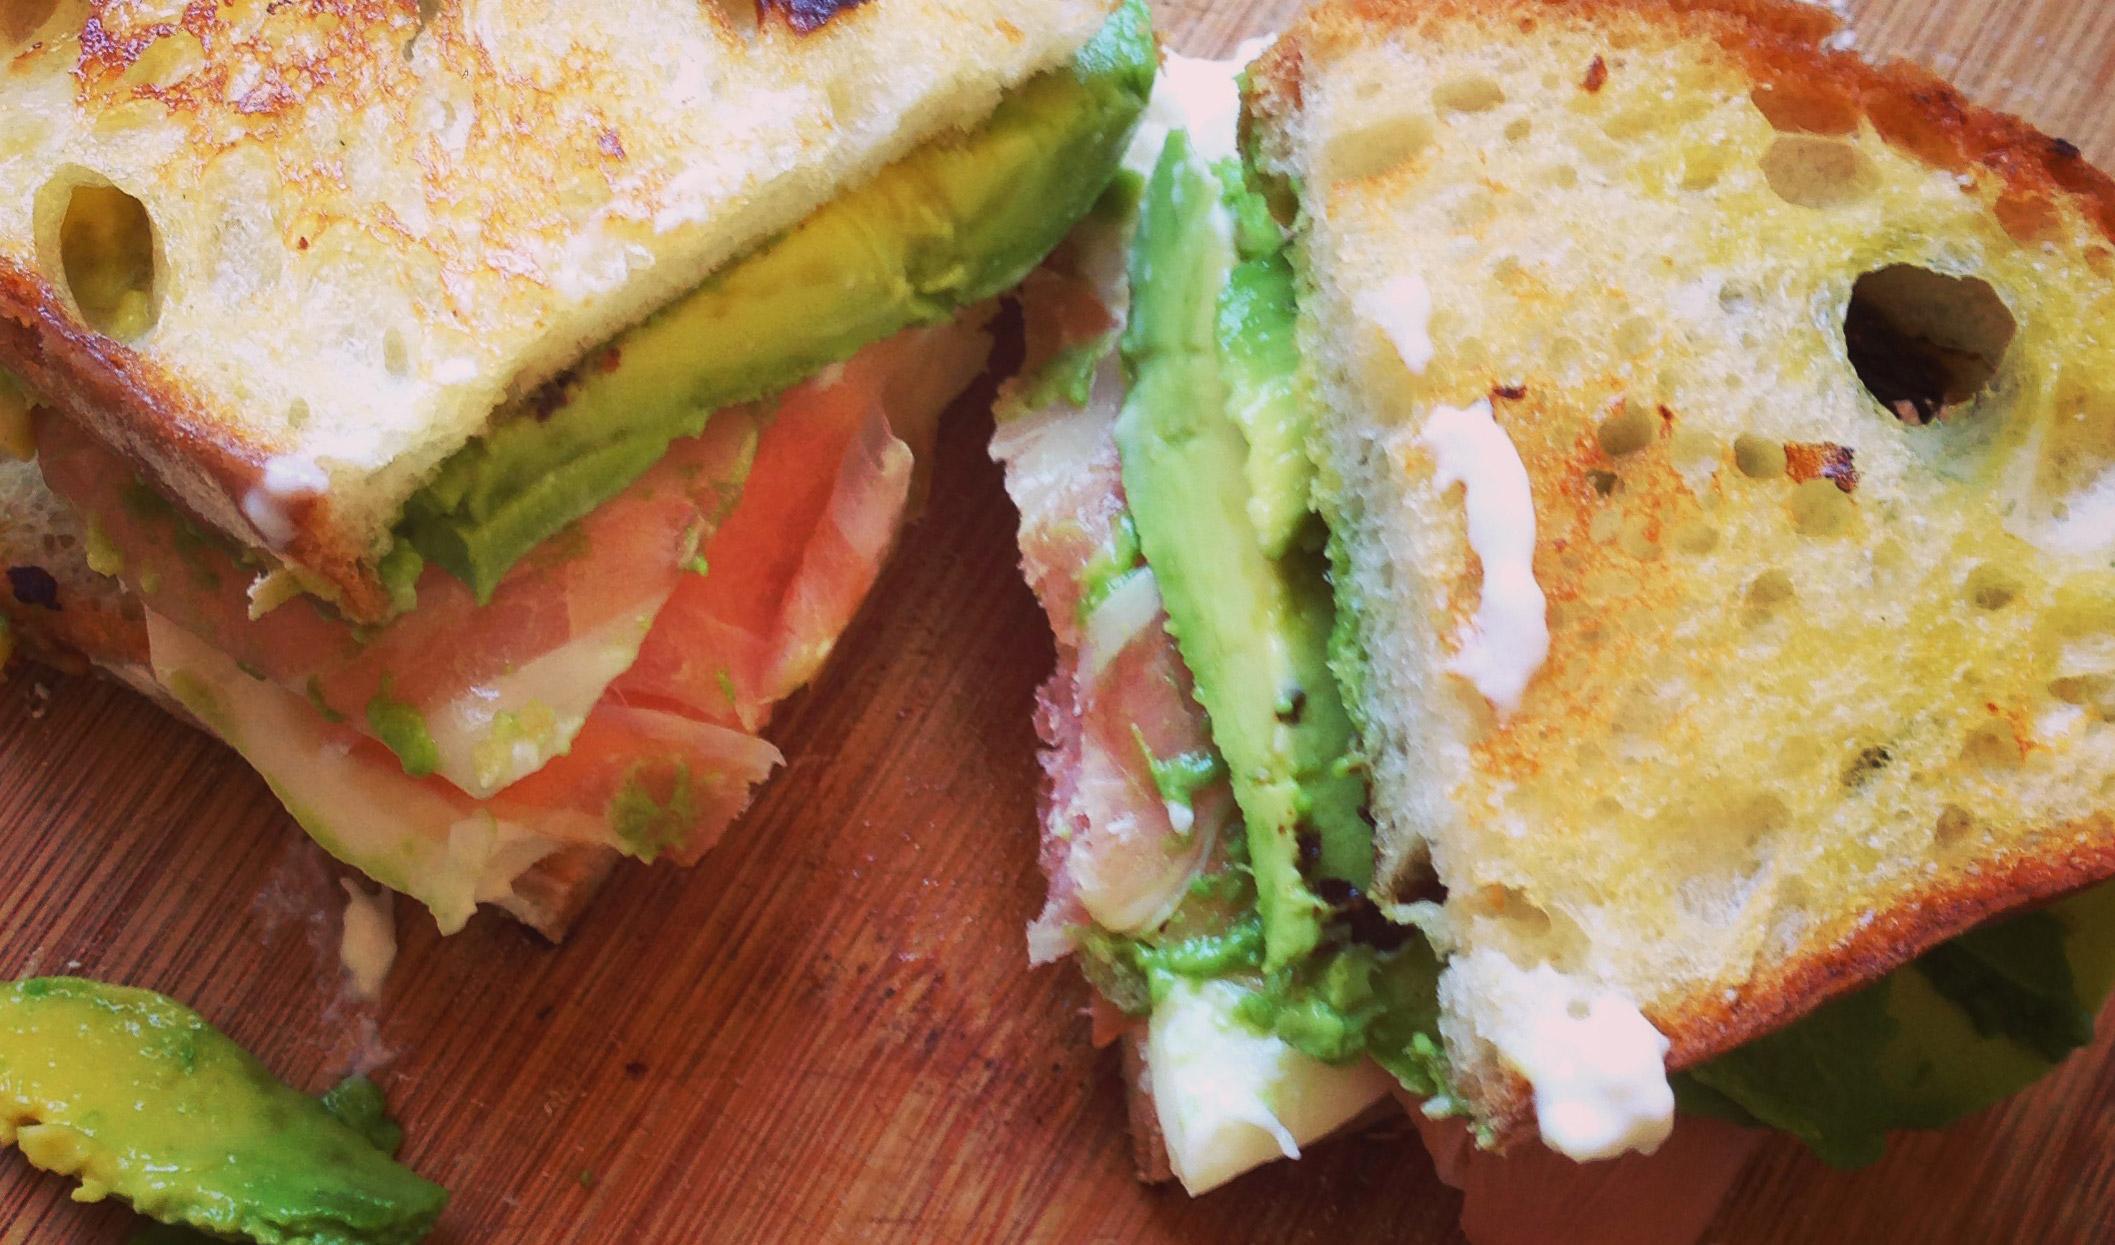 Amazing Sandwiches